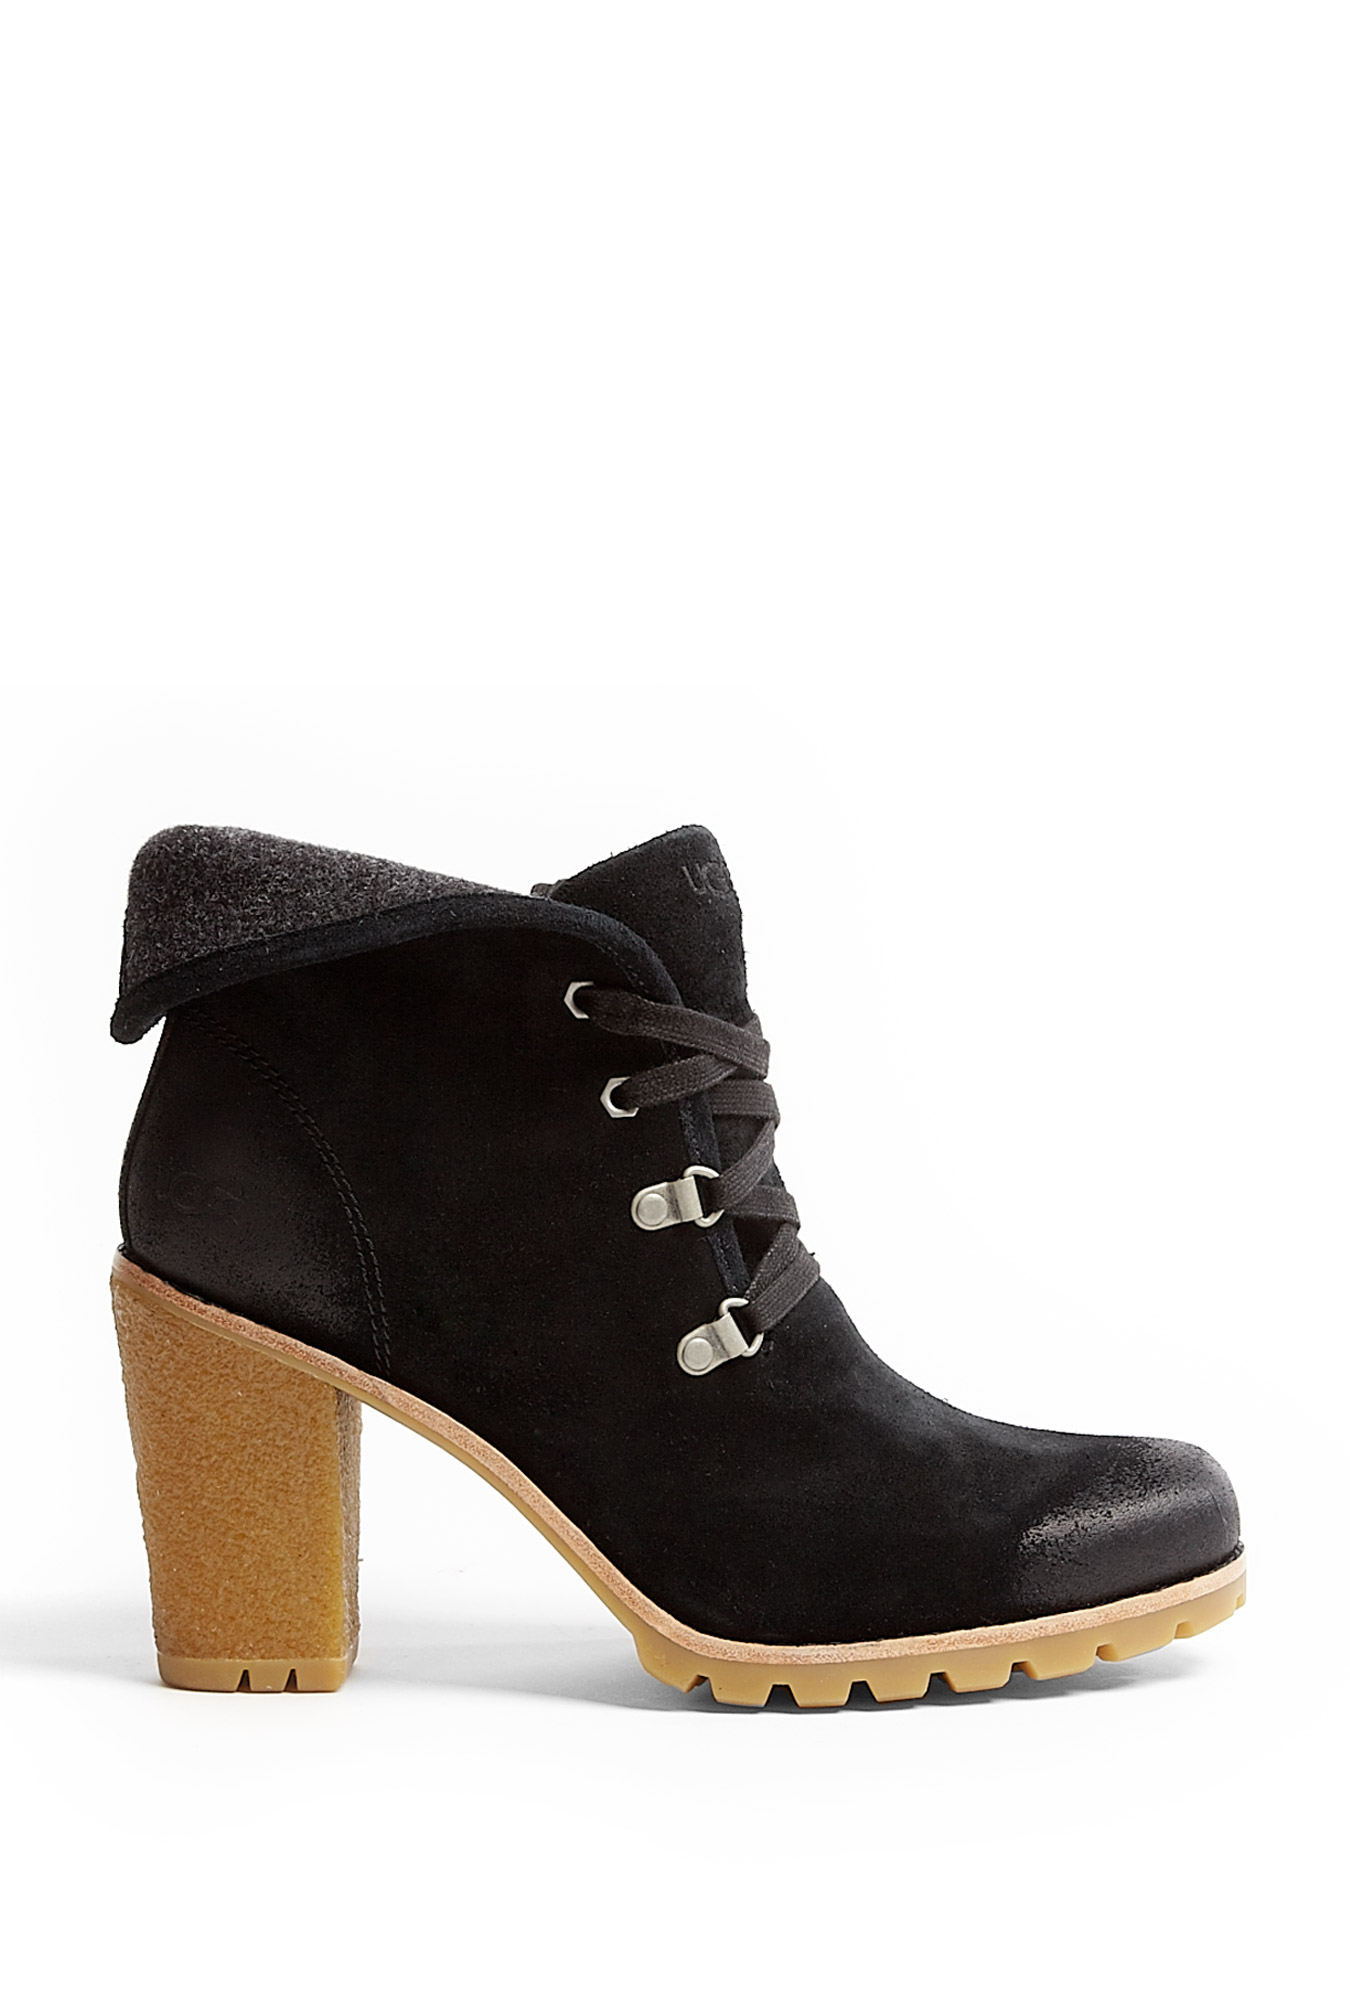 ugg black suede shoes